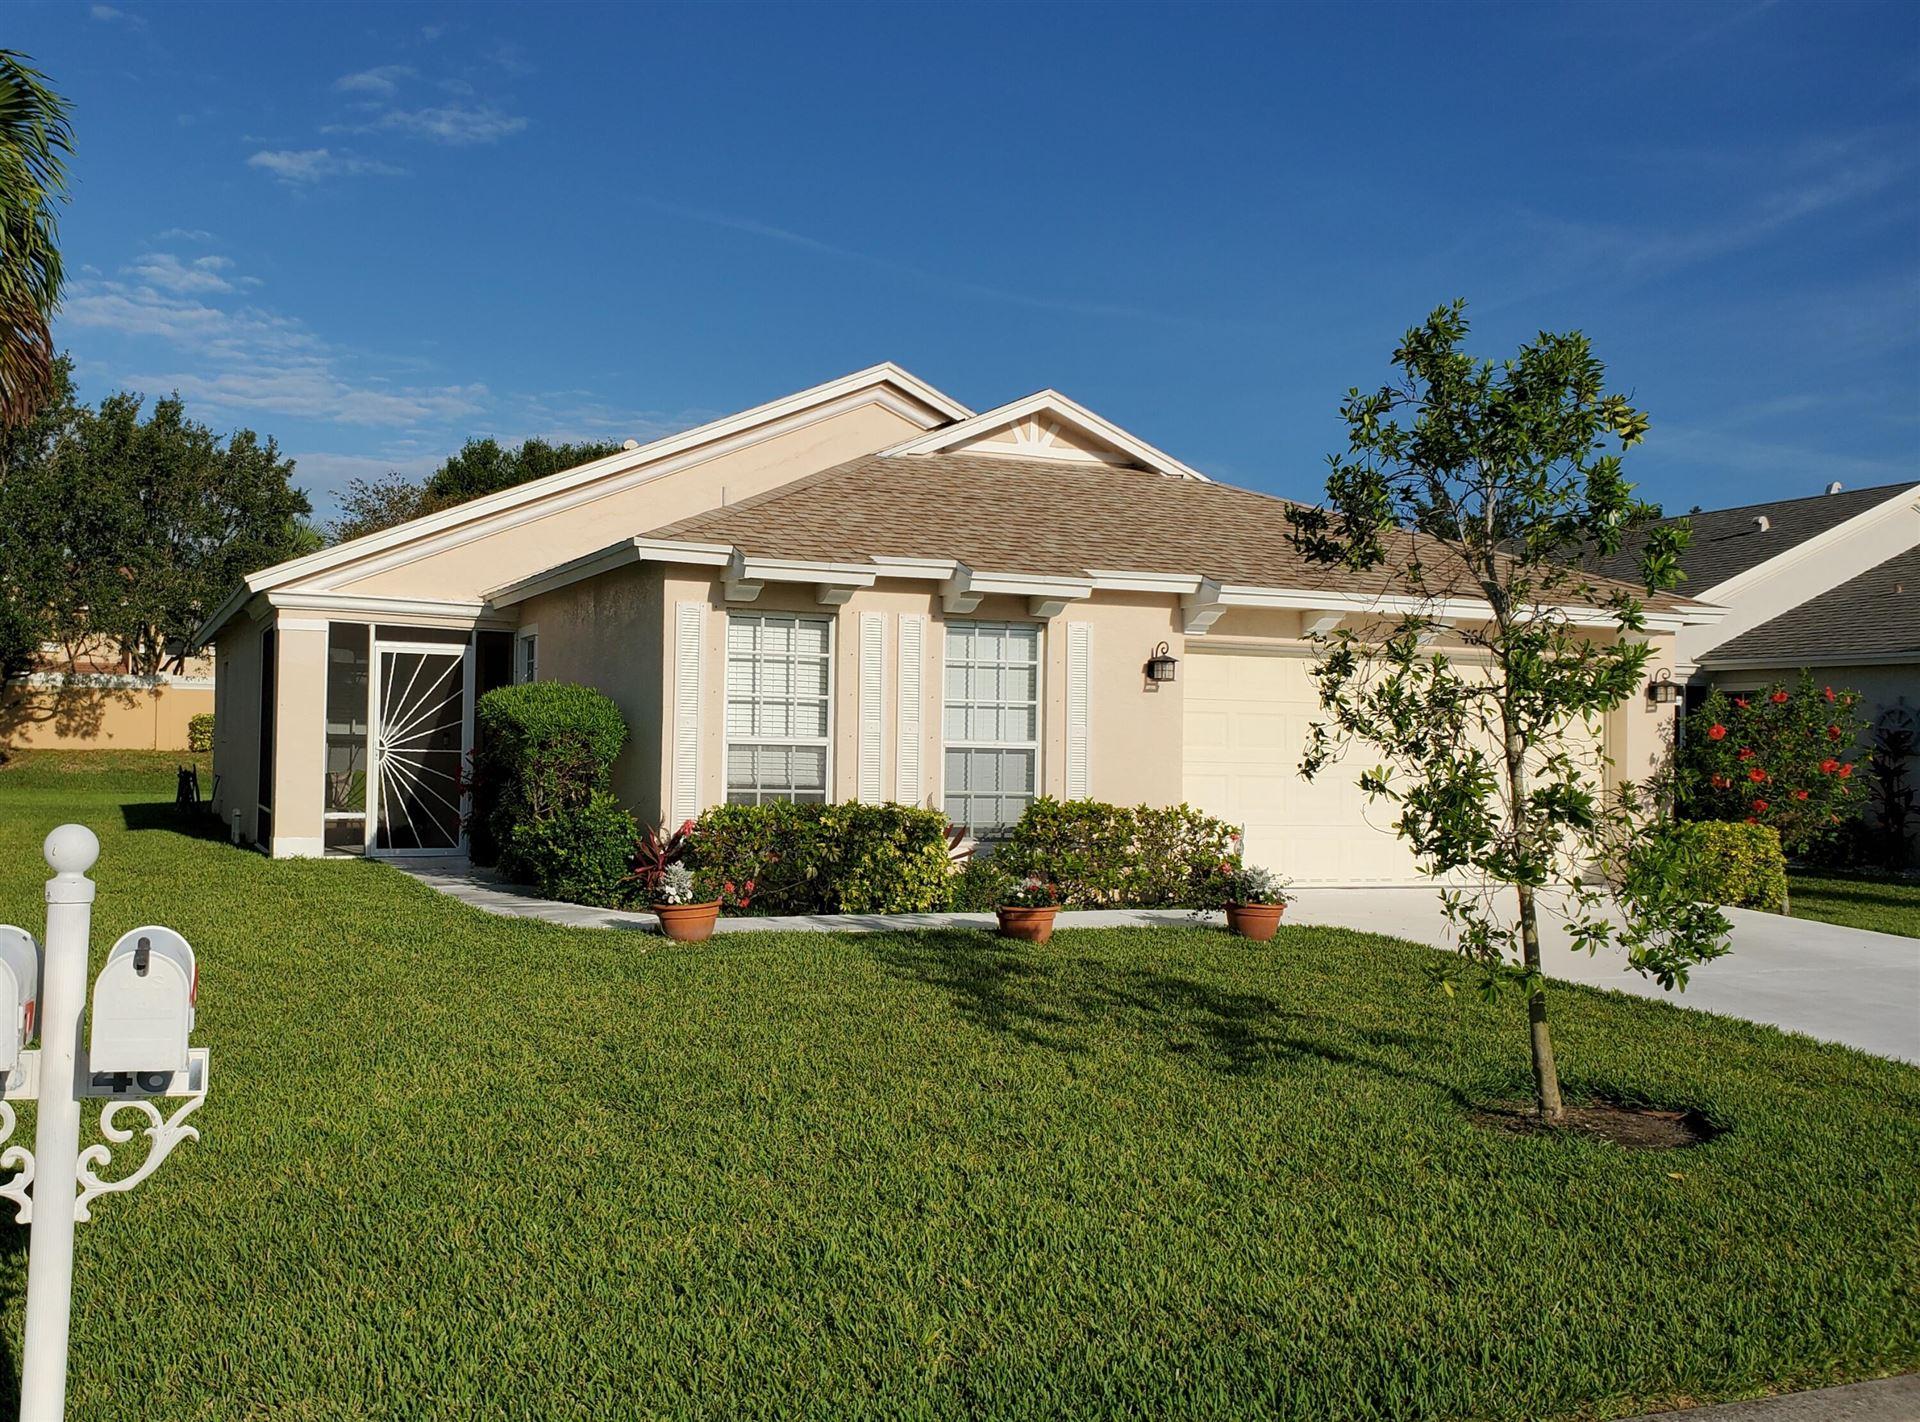 461 SW Talquin Lane, Port Saint Lucie, FL 34986 - MLS#: RX-10721955